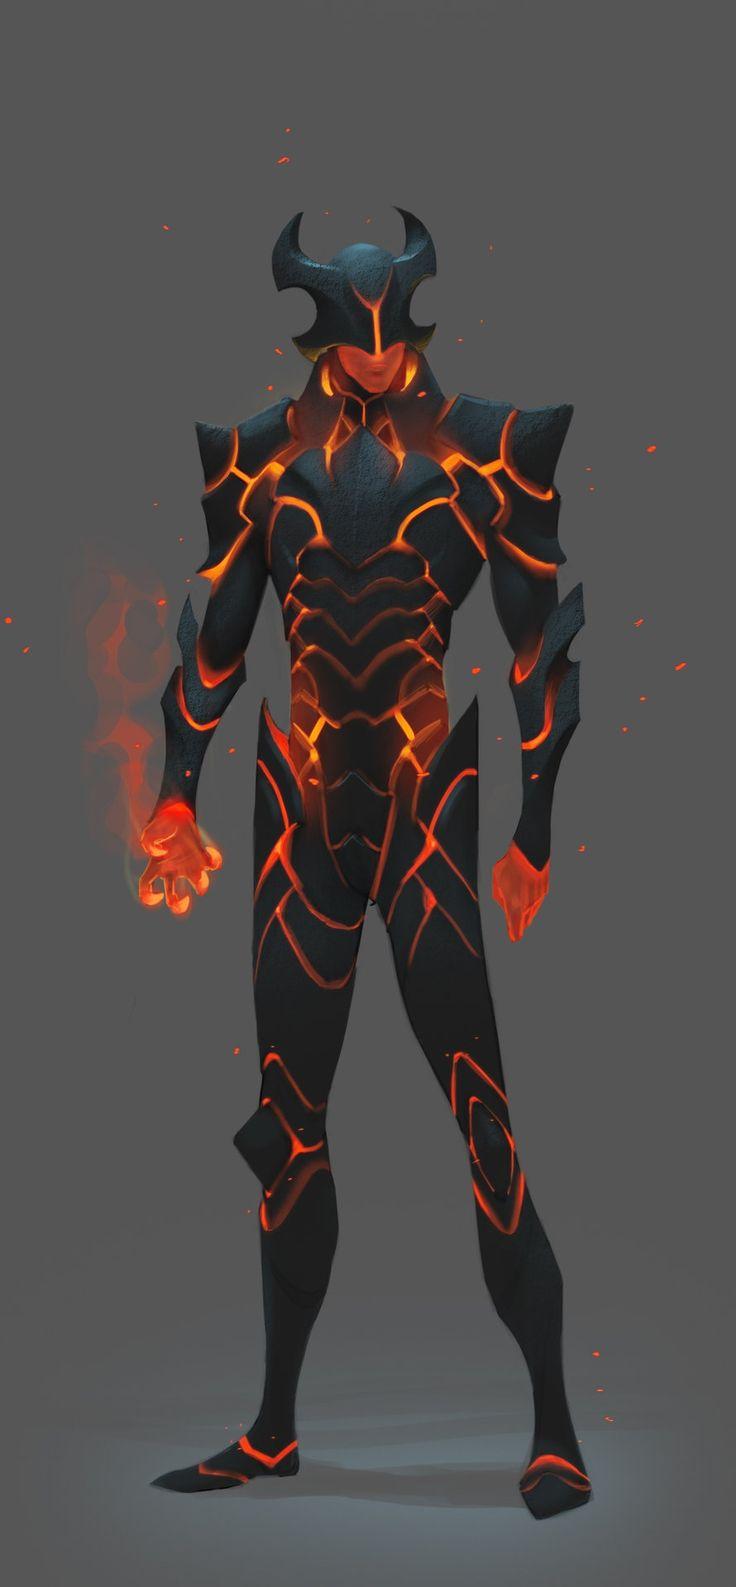 ArtStation - Fire Elemental, Rafael De Guzman